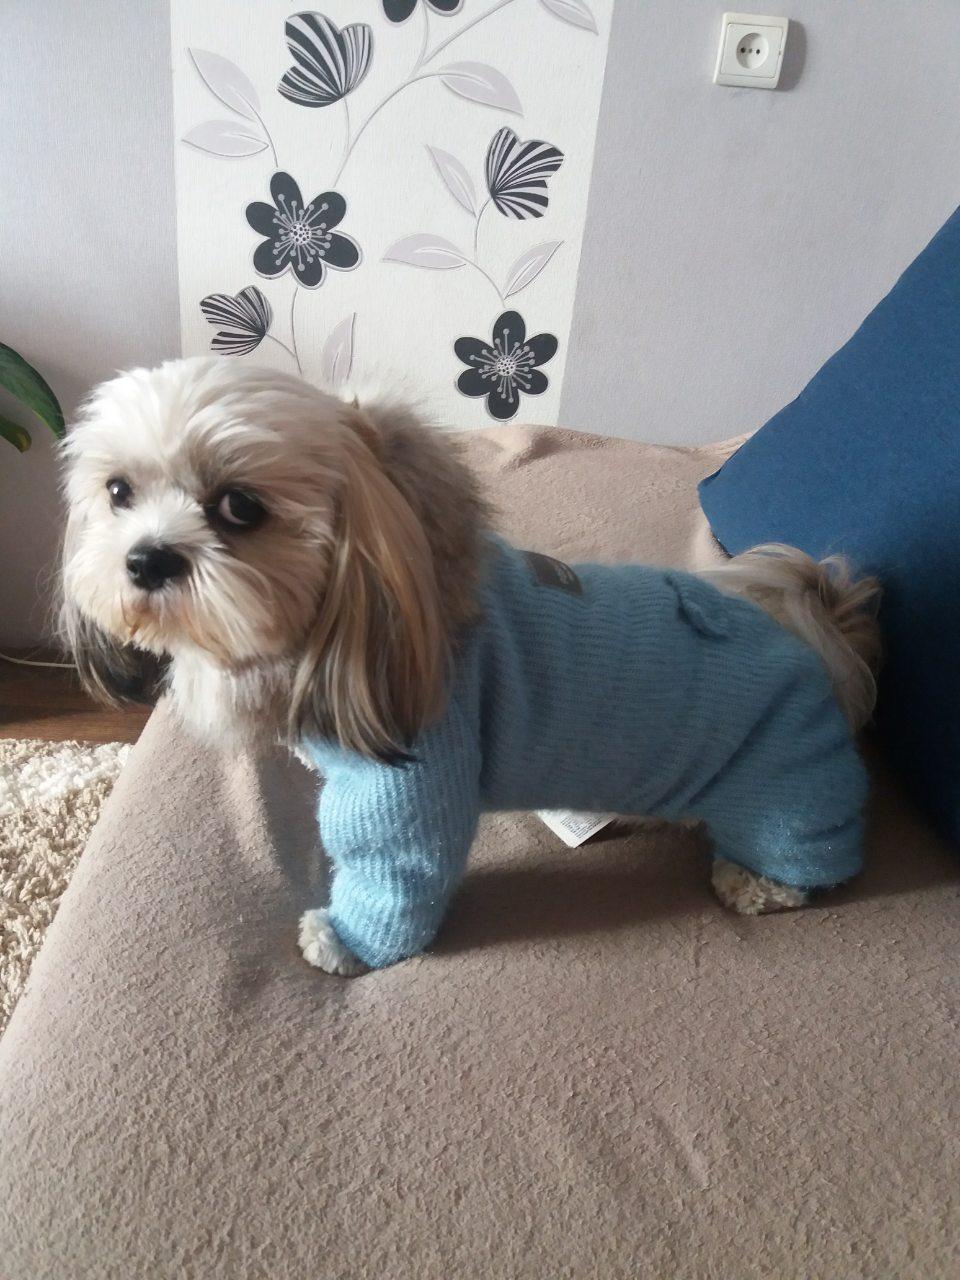 Комбинезон для собаки Pet Fashion Шанти M, Длина спины 33-36, обхват груди 41-48 см